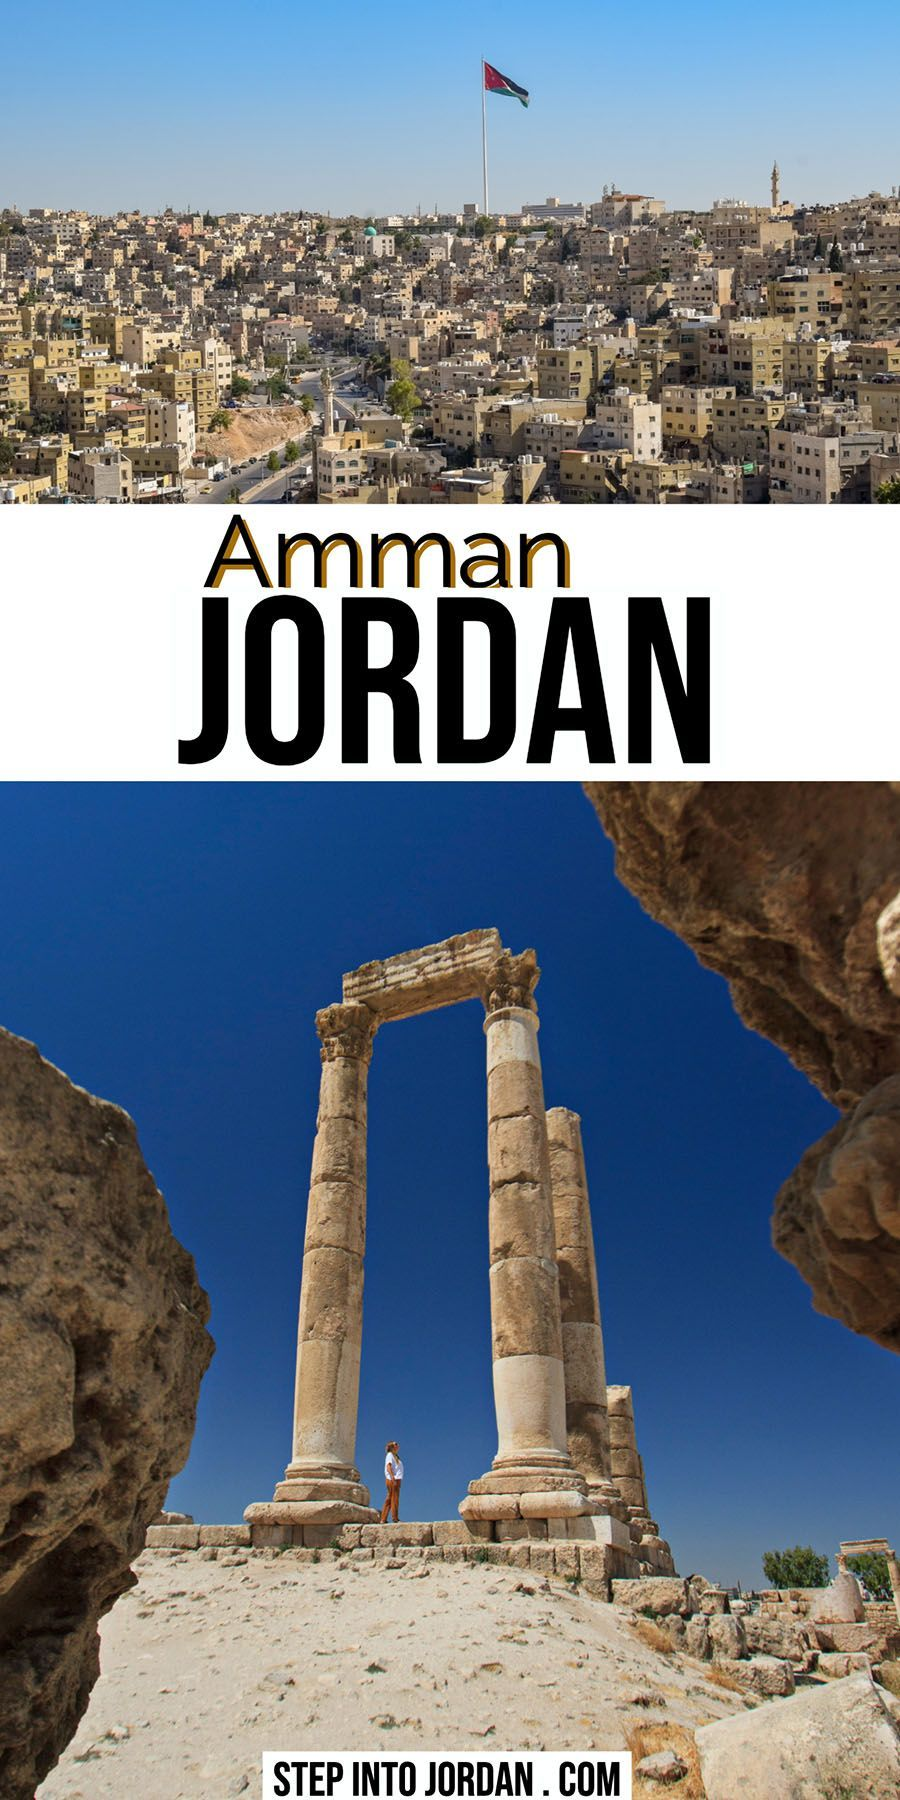 Visit Amman Jordan | Amman Travel Tips | Jordan Travel Tips | Amman Guide | Middle East Travel #amman #jordan #travel #ammanjordan #ammanjordan Visit Amman Jordan | Amman Travel Tips | Jordan Travel Tips | Amman Guide | Middle East Travel #amman #jordan #travel #ammanjordan #ammanjordan